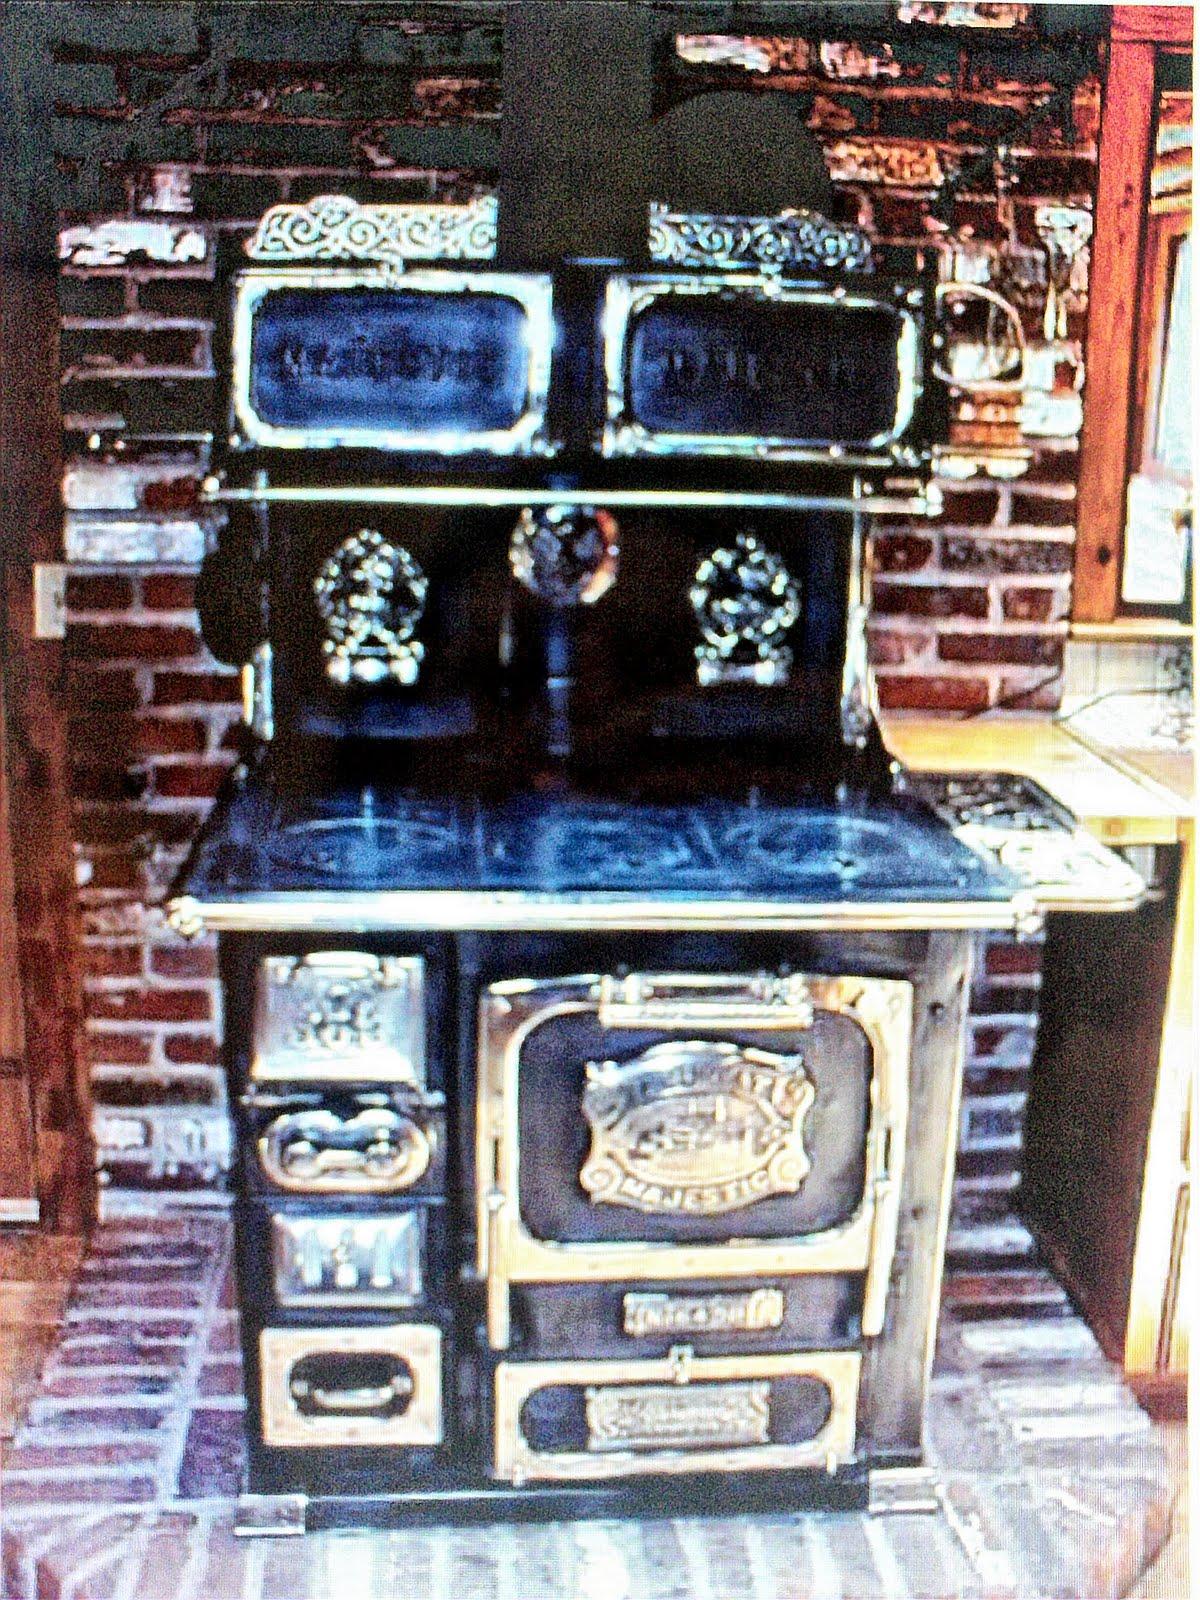 Antique wood cook stove Majestic Junior Salesman Sample toy Very